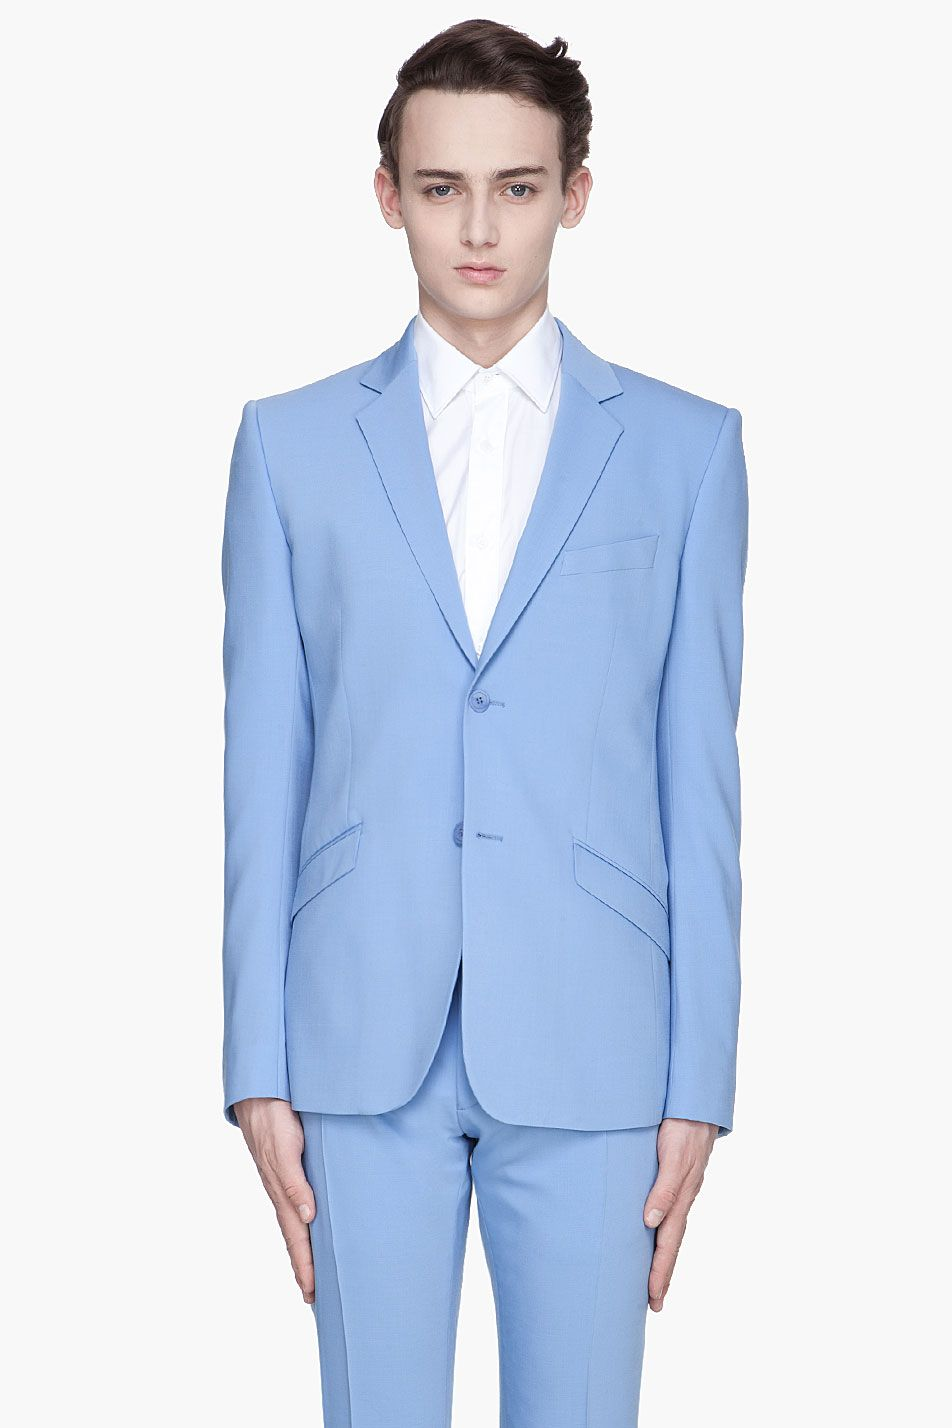 Mugler powder blue wool twobutton suit blazer style